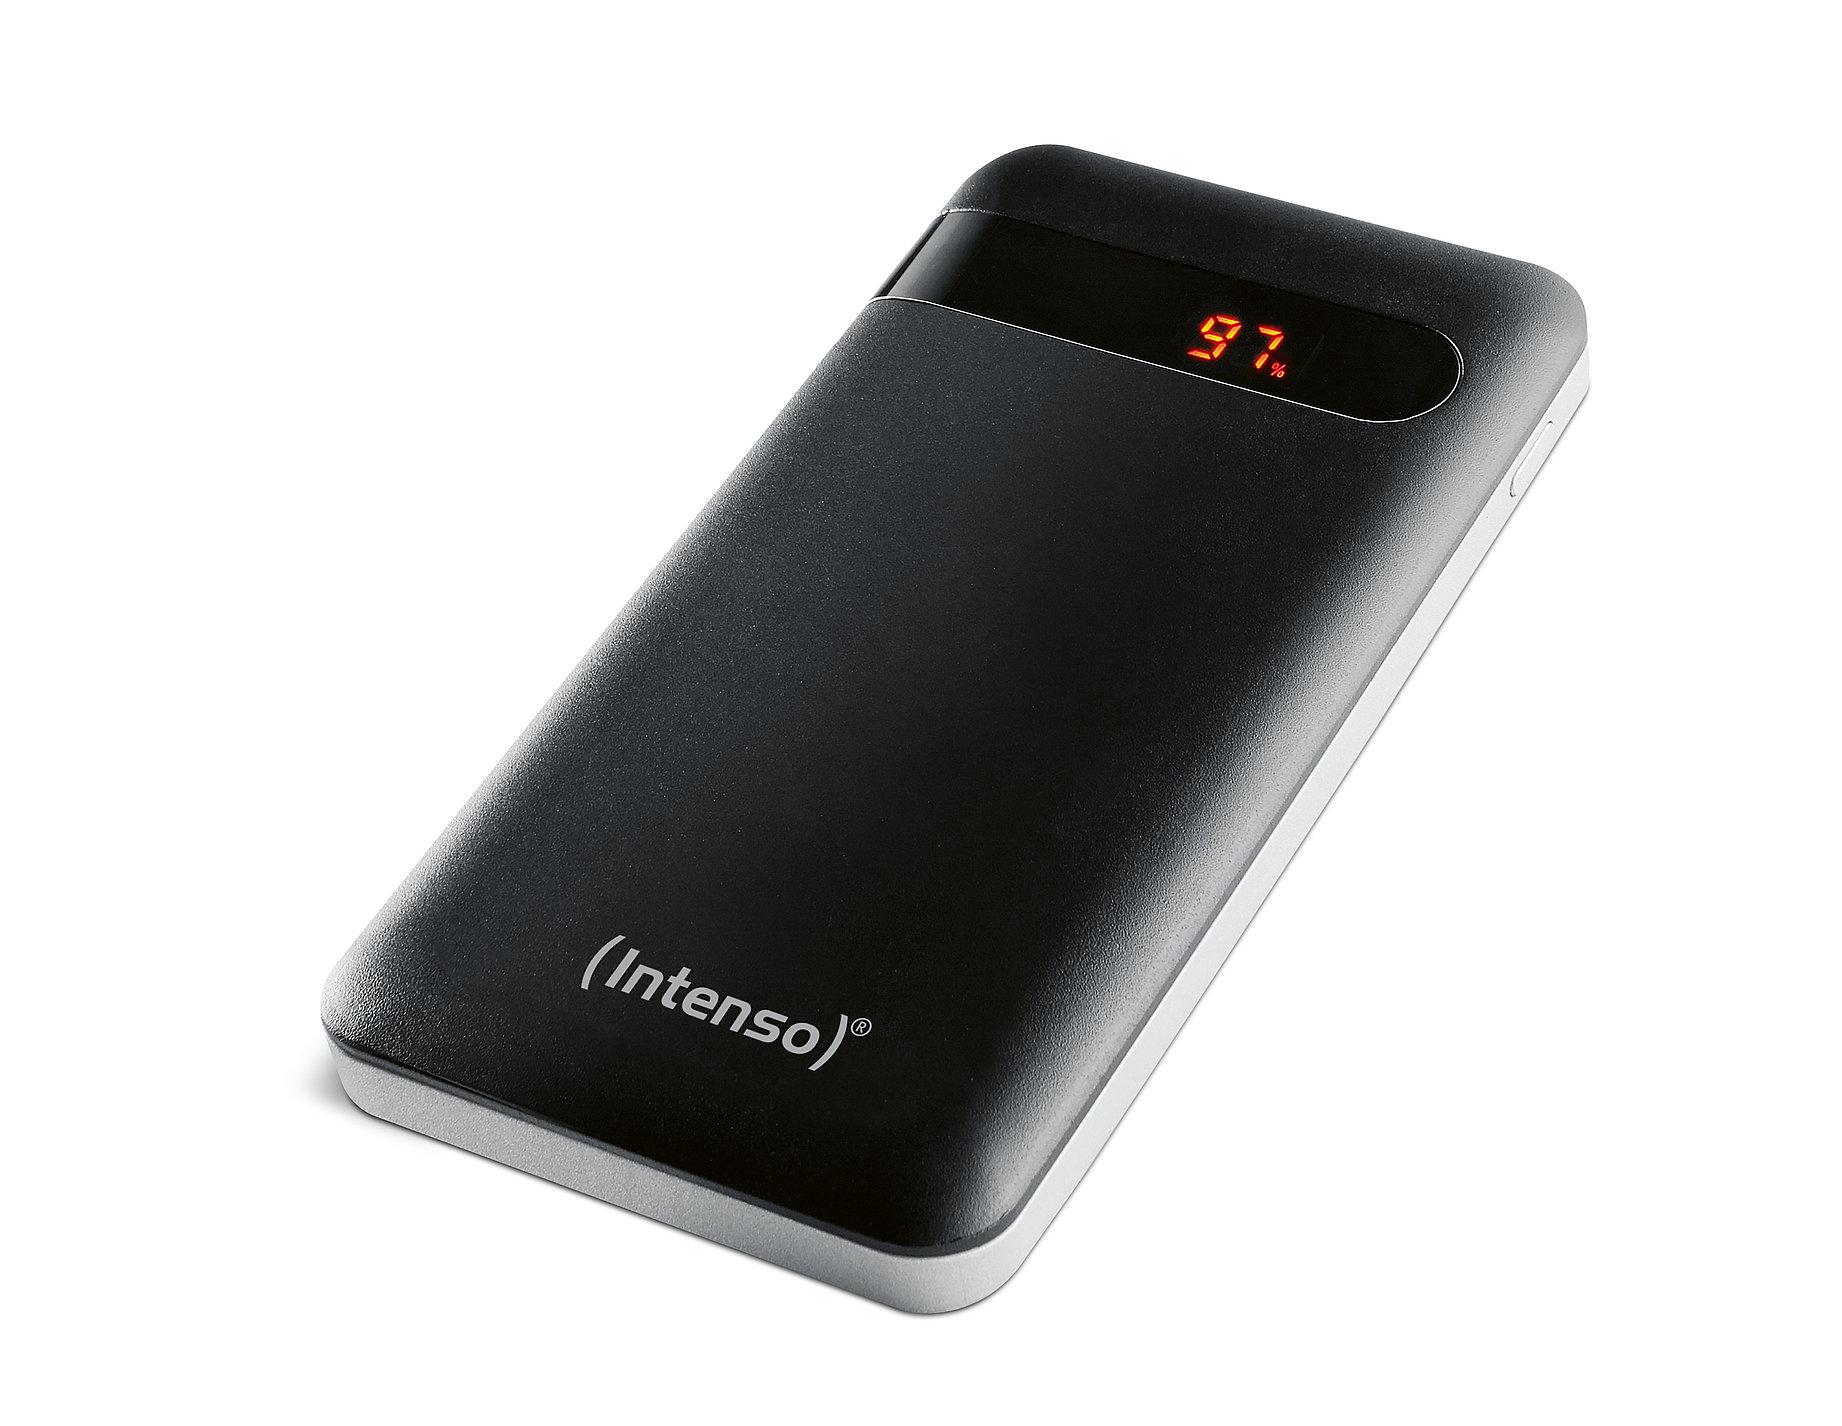 Powerbank PD10000 | Red Dot Design Award